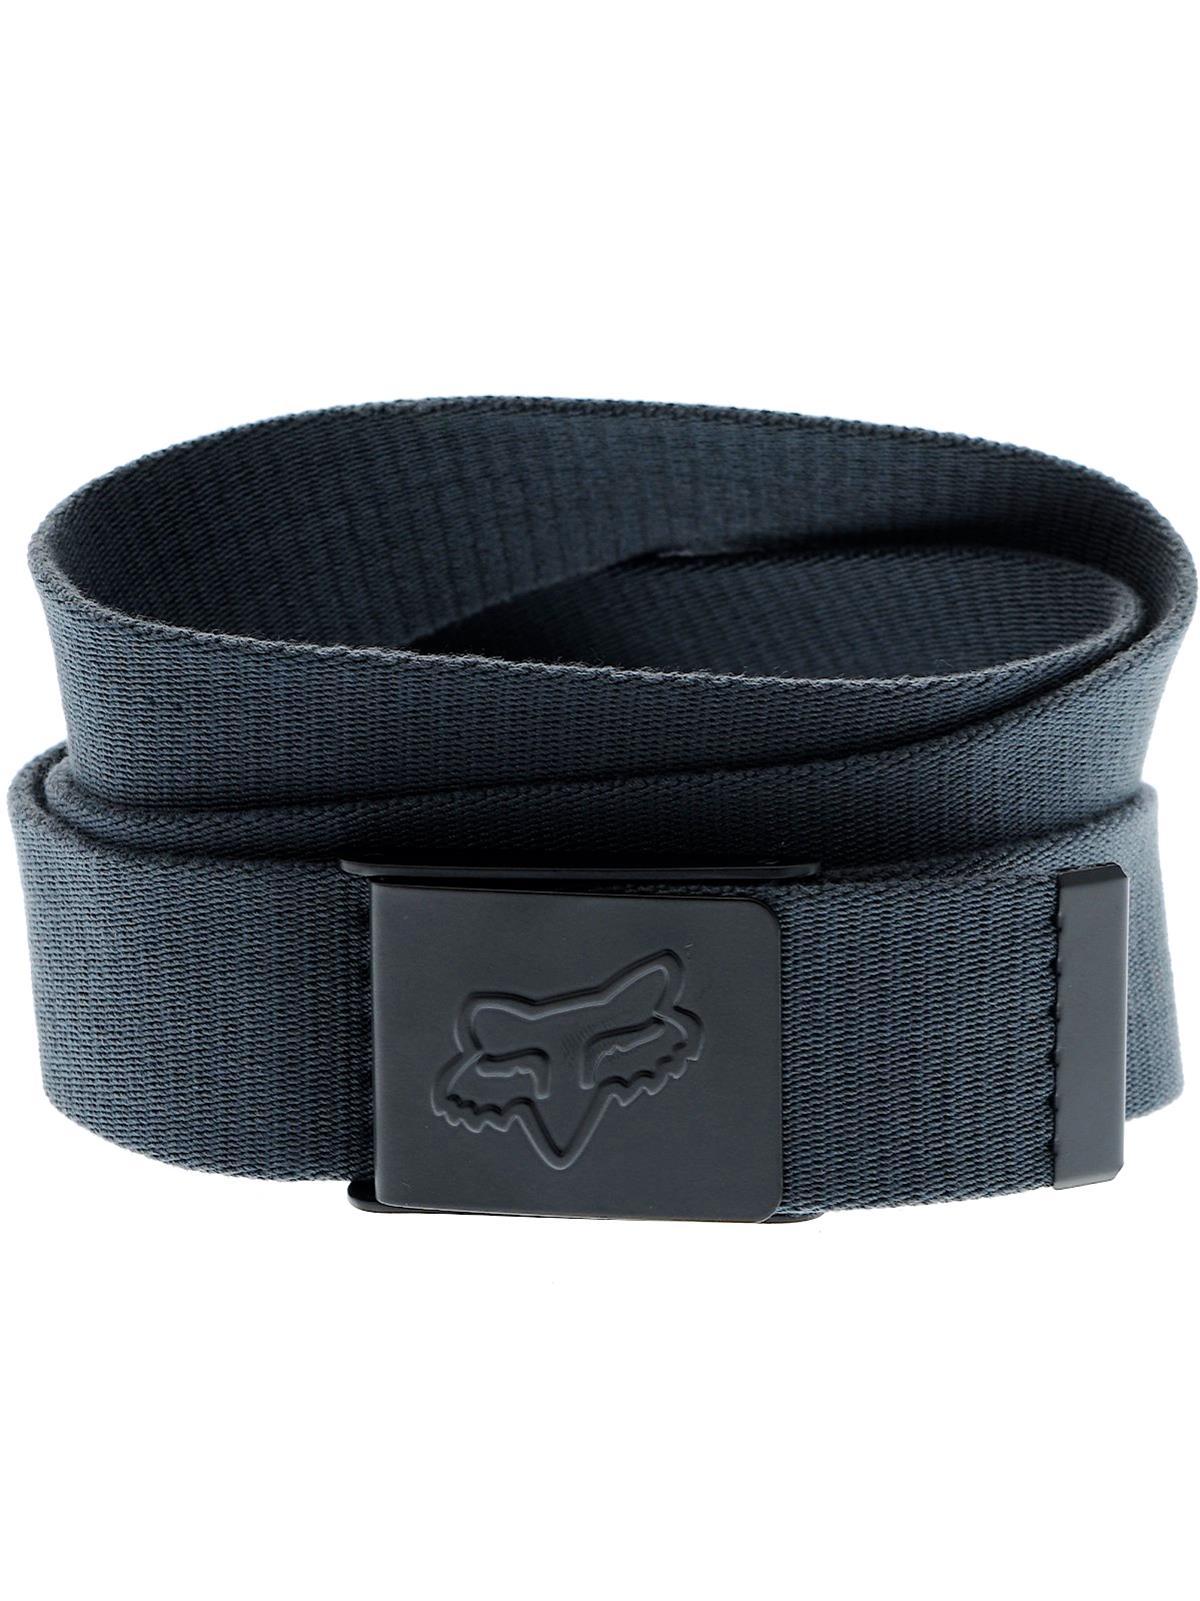 cinto fox mr. clean web belt charcoal